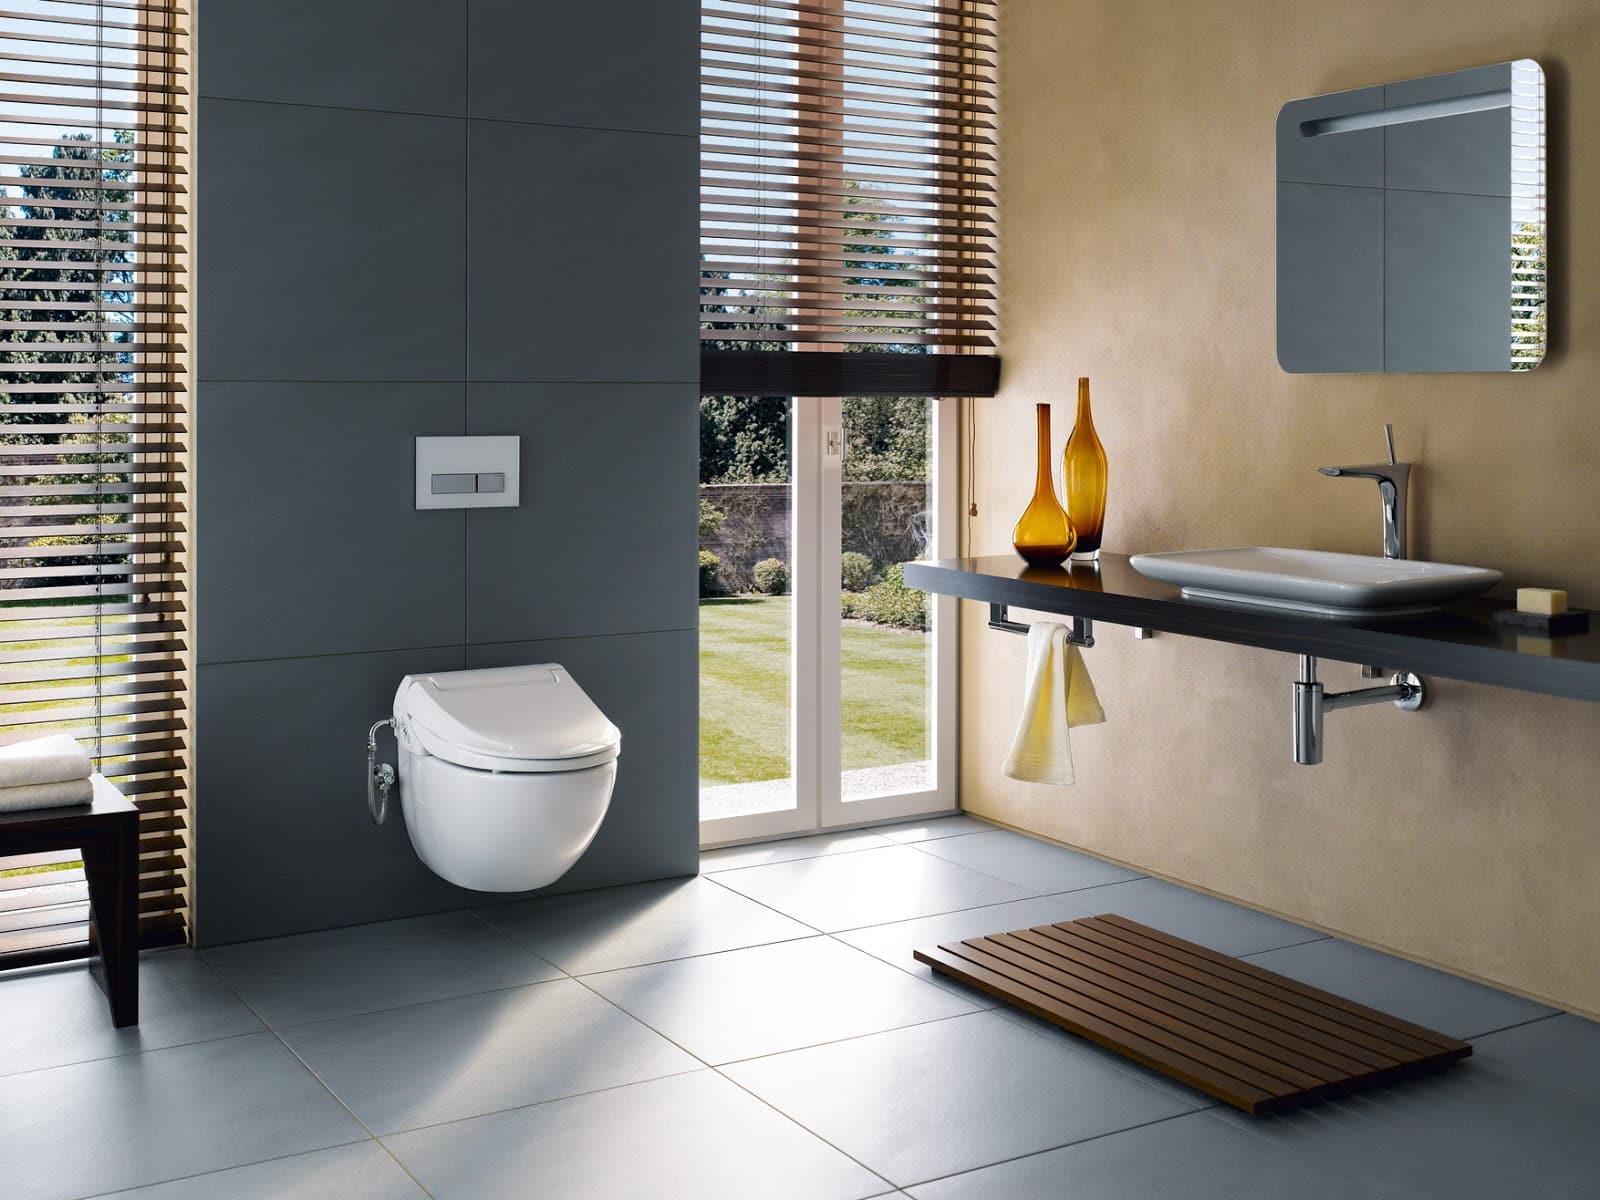 Dusch WC Geberit AquaClean 4000